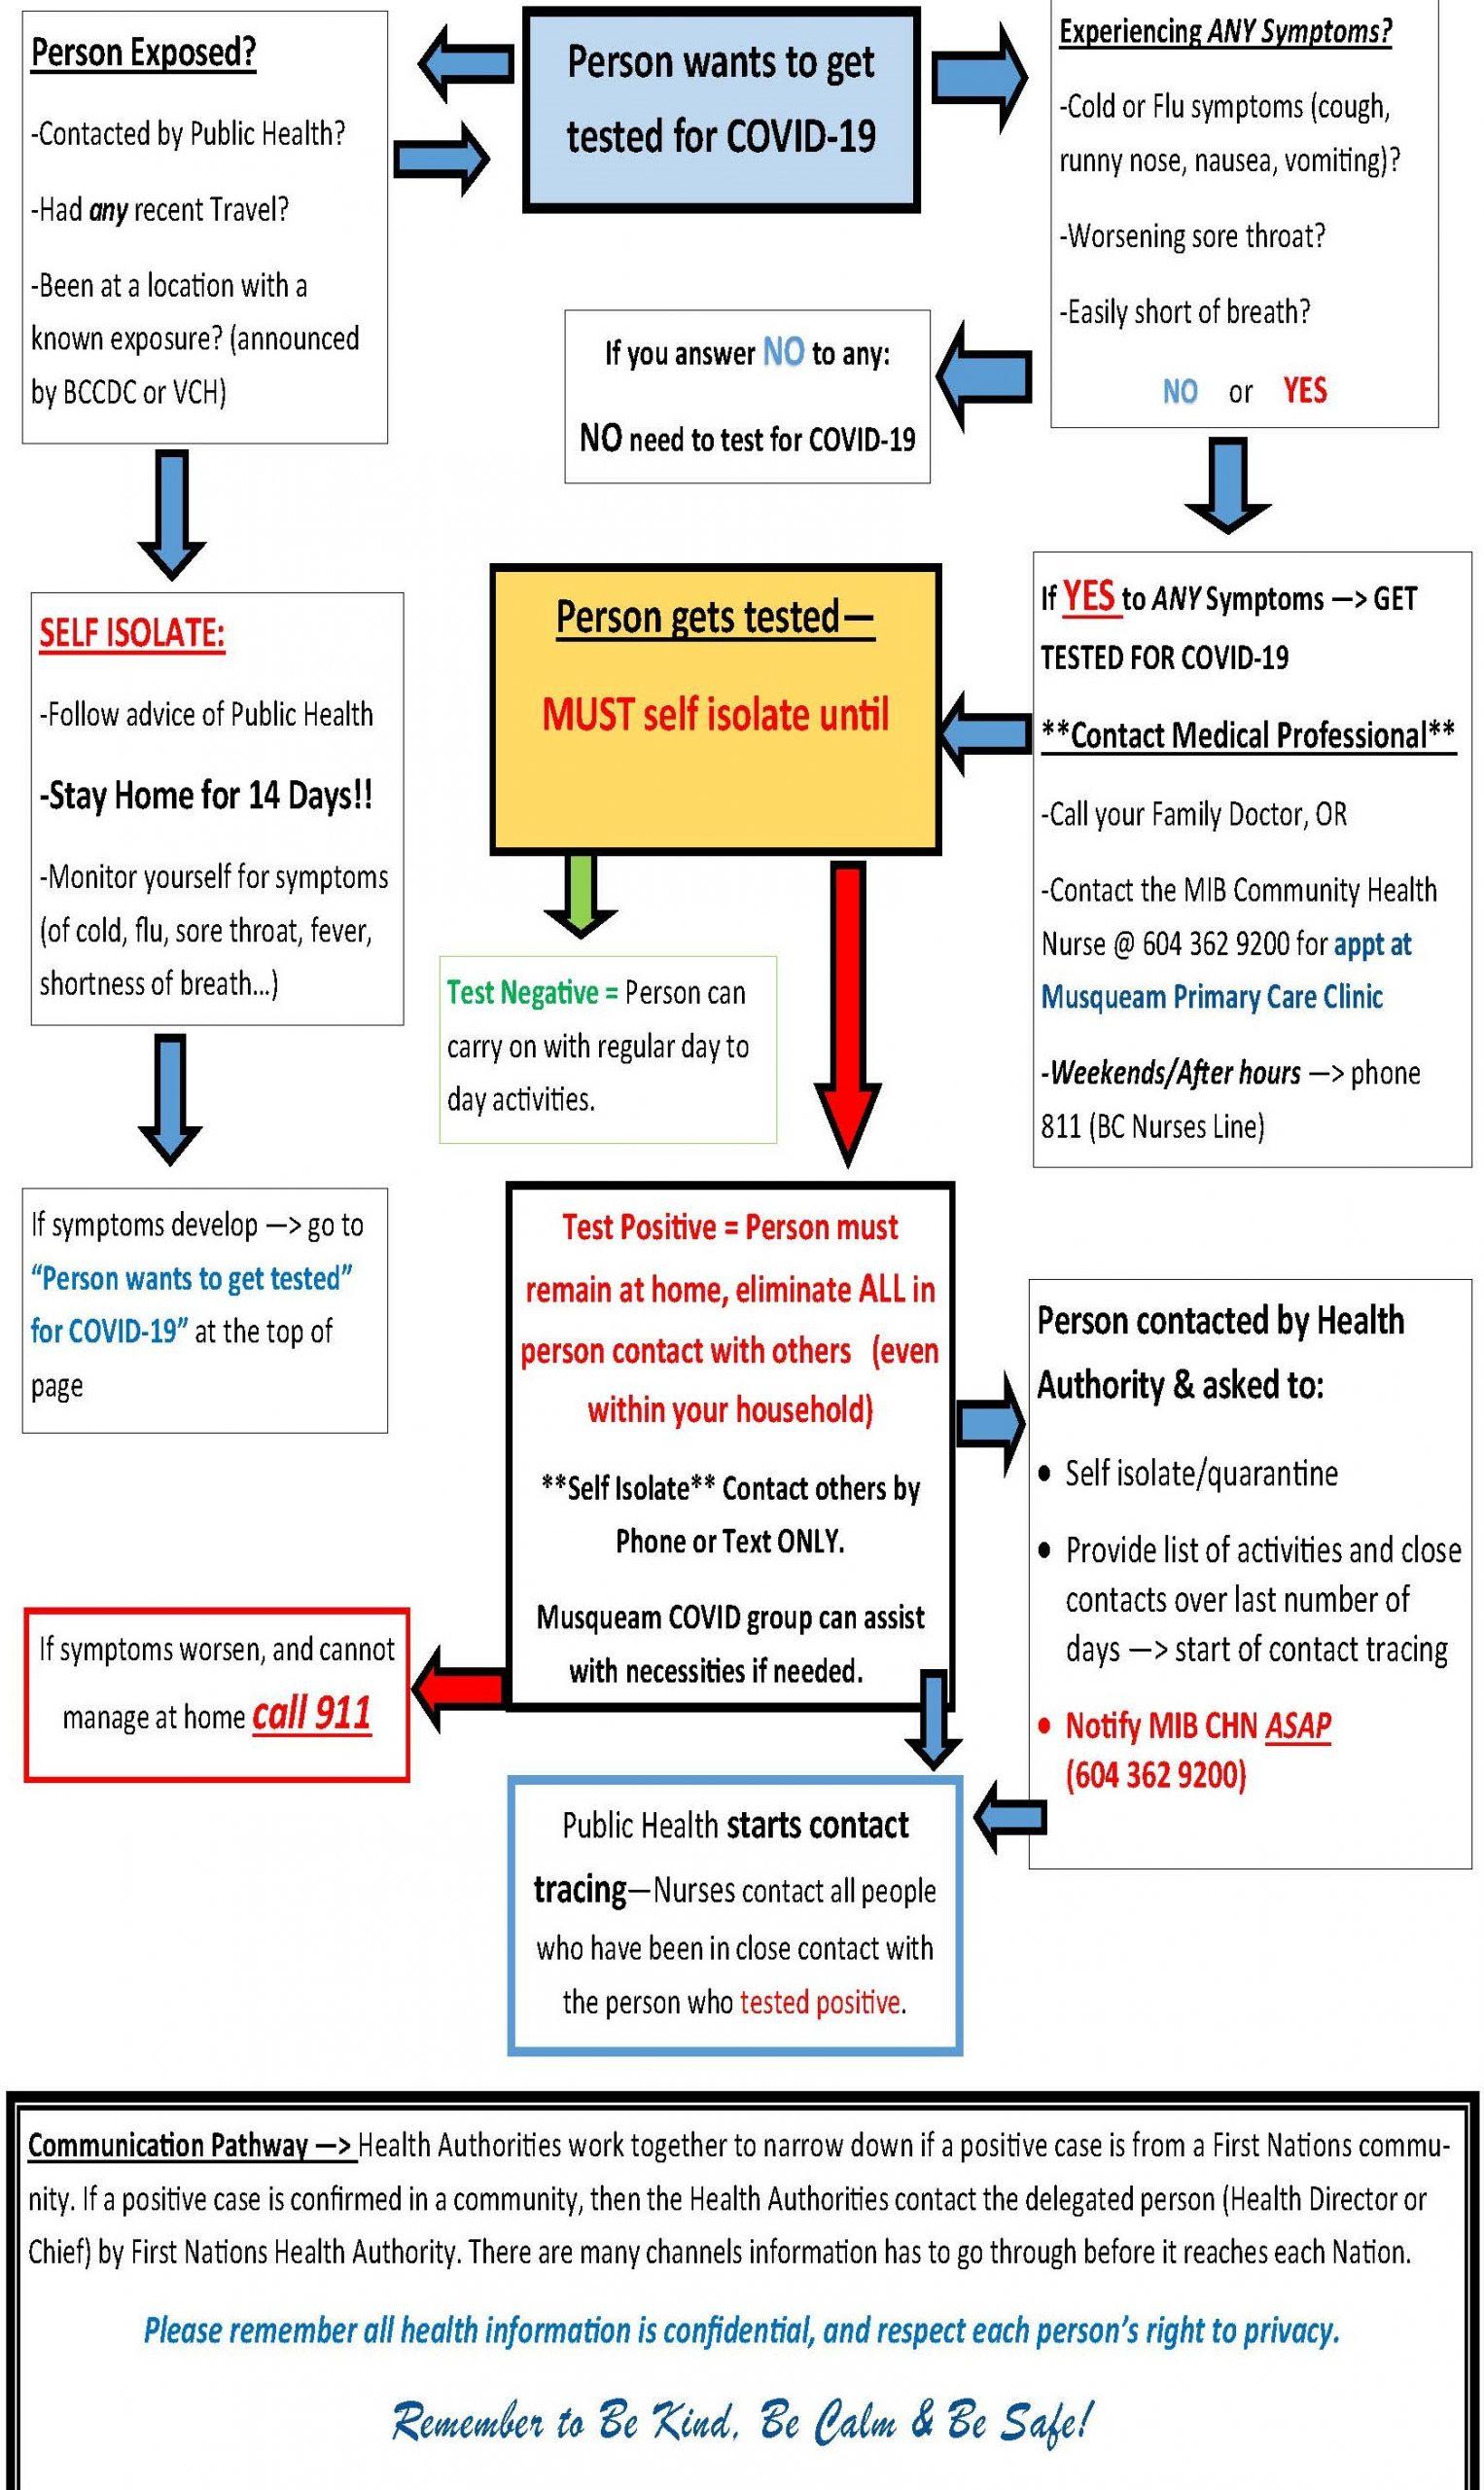 MIB Health COVID-19 testing flow chart